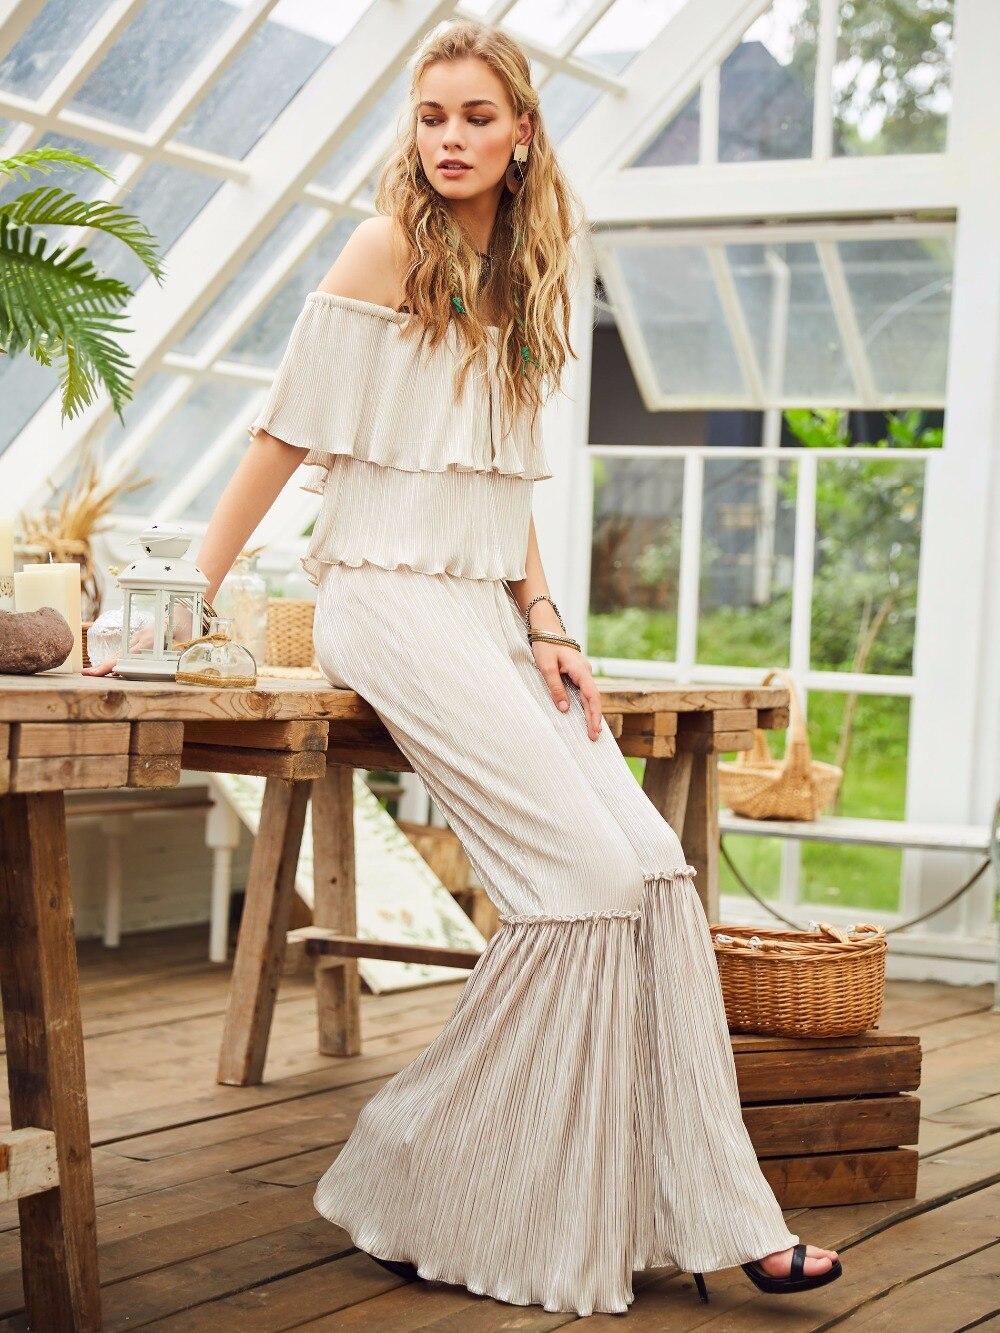 Women's Clothing Popular Brand White Slash Neck Jumpsuit Long Bohemian Romper Women Backless Ruffles Flare Pant Elegant Fashion Office Casual Boho Jumpsuits